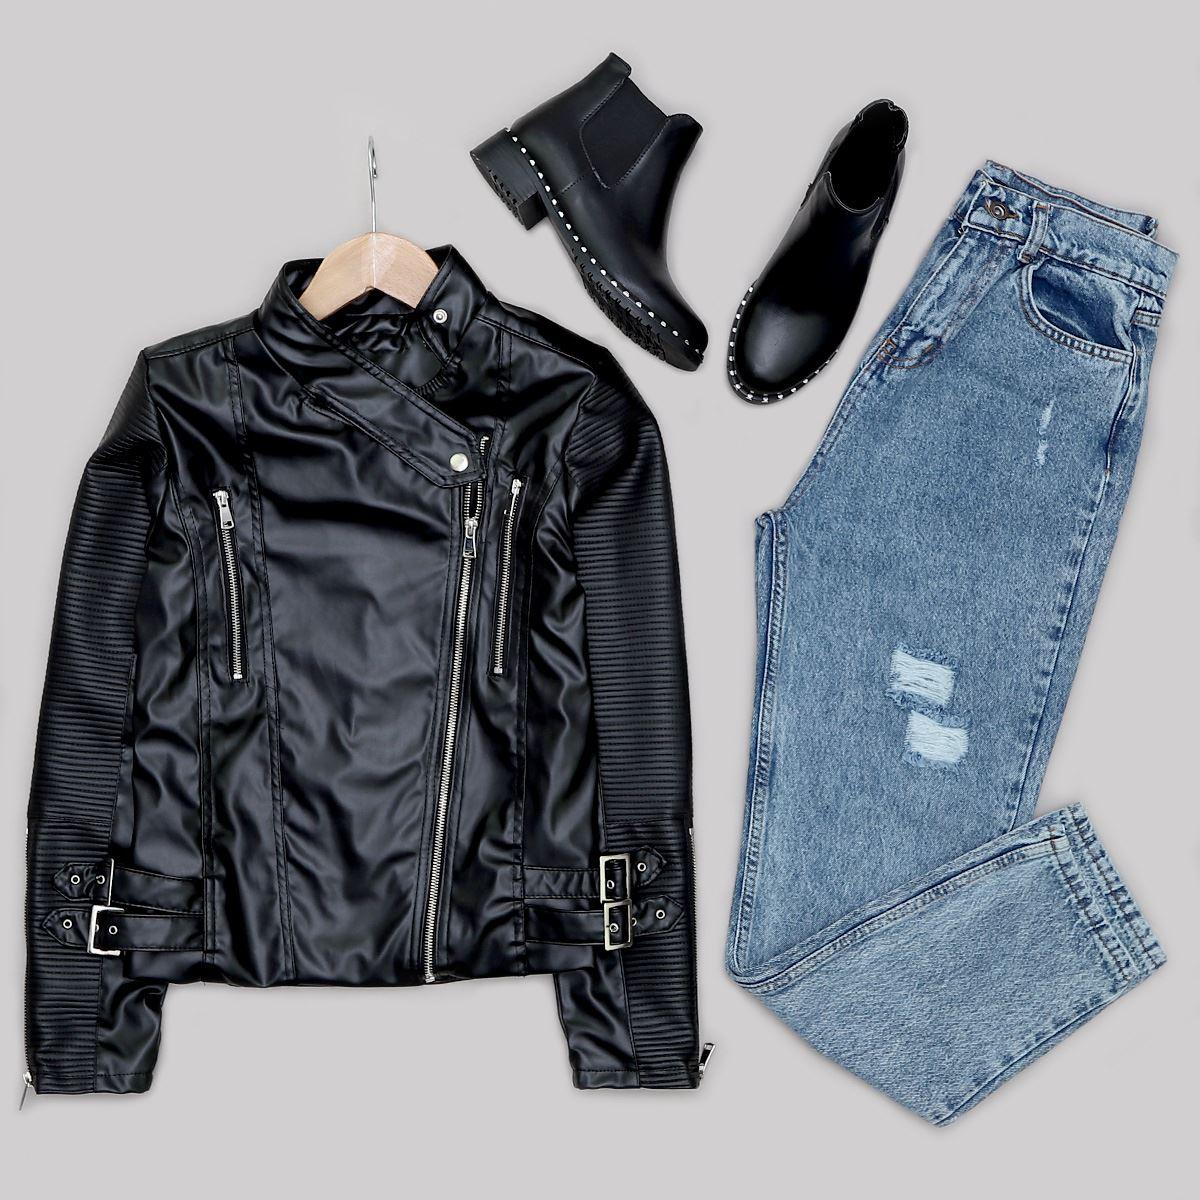 Siyah Fermuarlı Deri Ceket CKT187